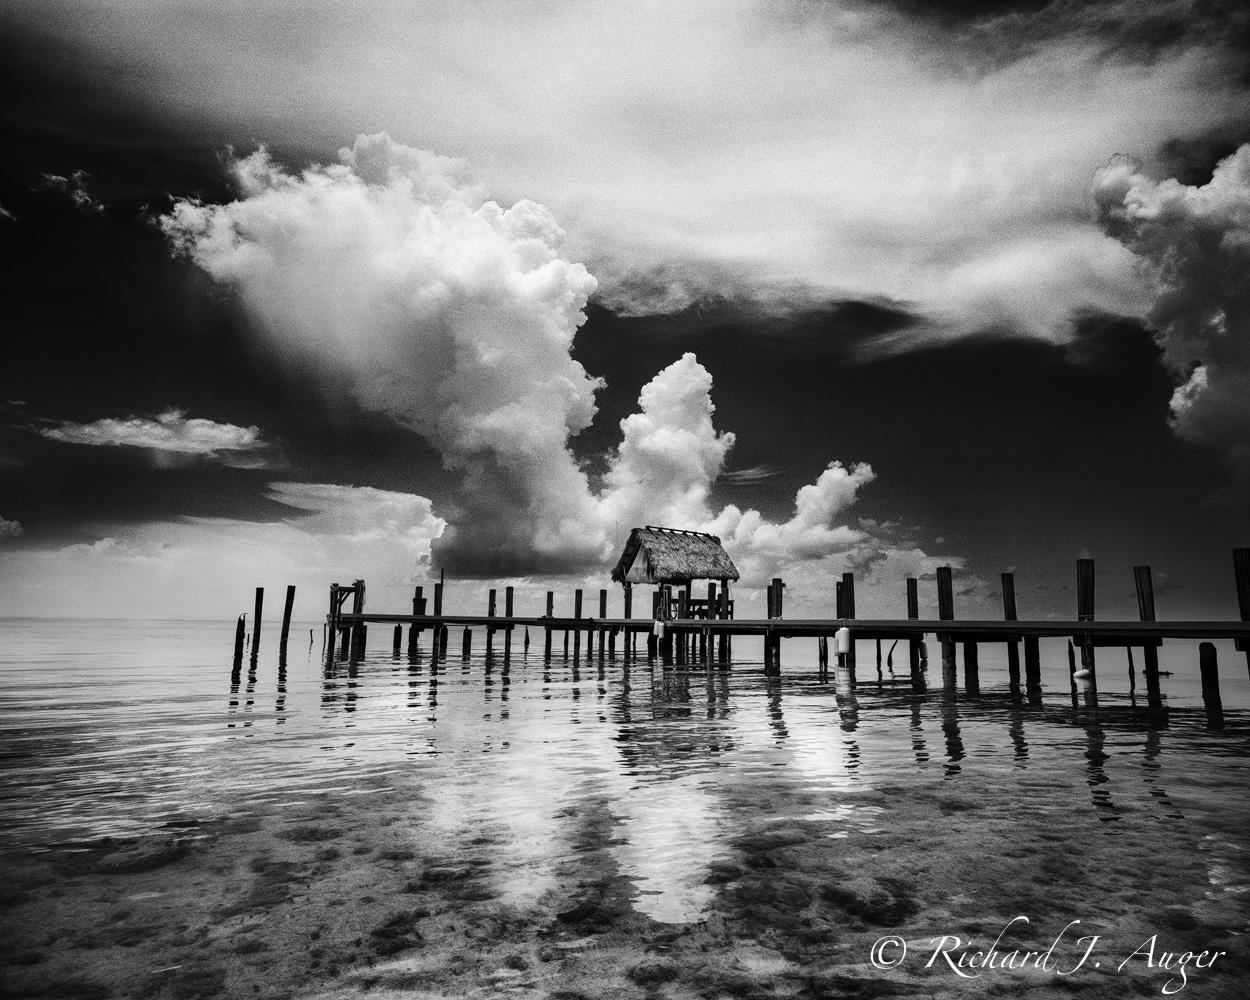 Pigeon Key, Florida Keys, Overseas Highway, Dock, Clouds, Storm, Landscape, Monochrome, photograph